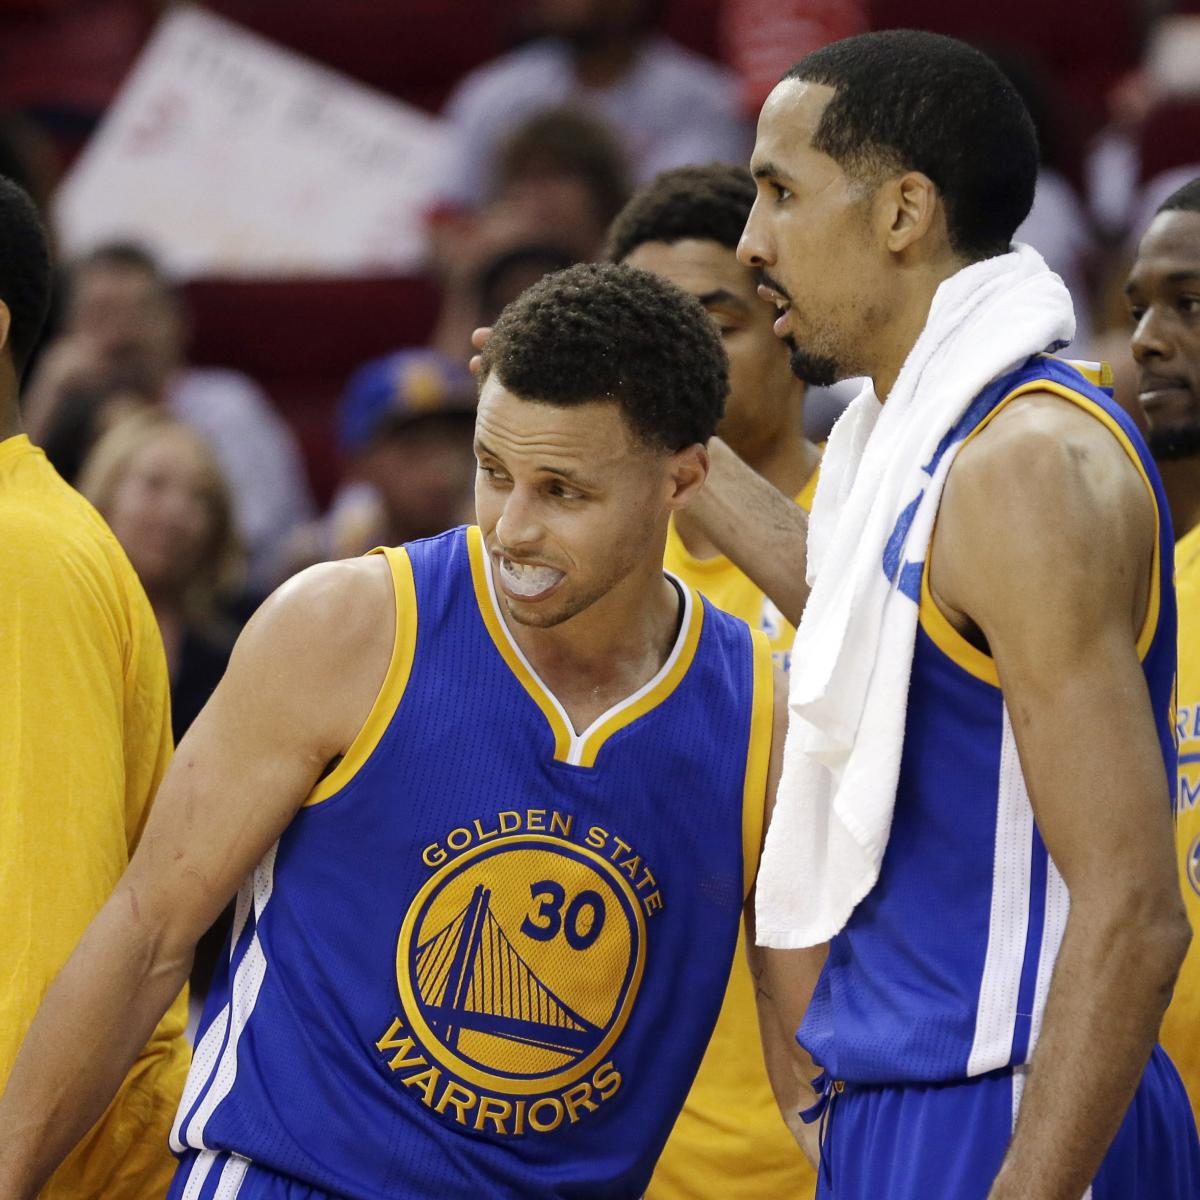 Golden State Warriors Vs. Houston Rockets: Game 4 Odds